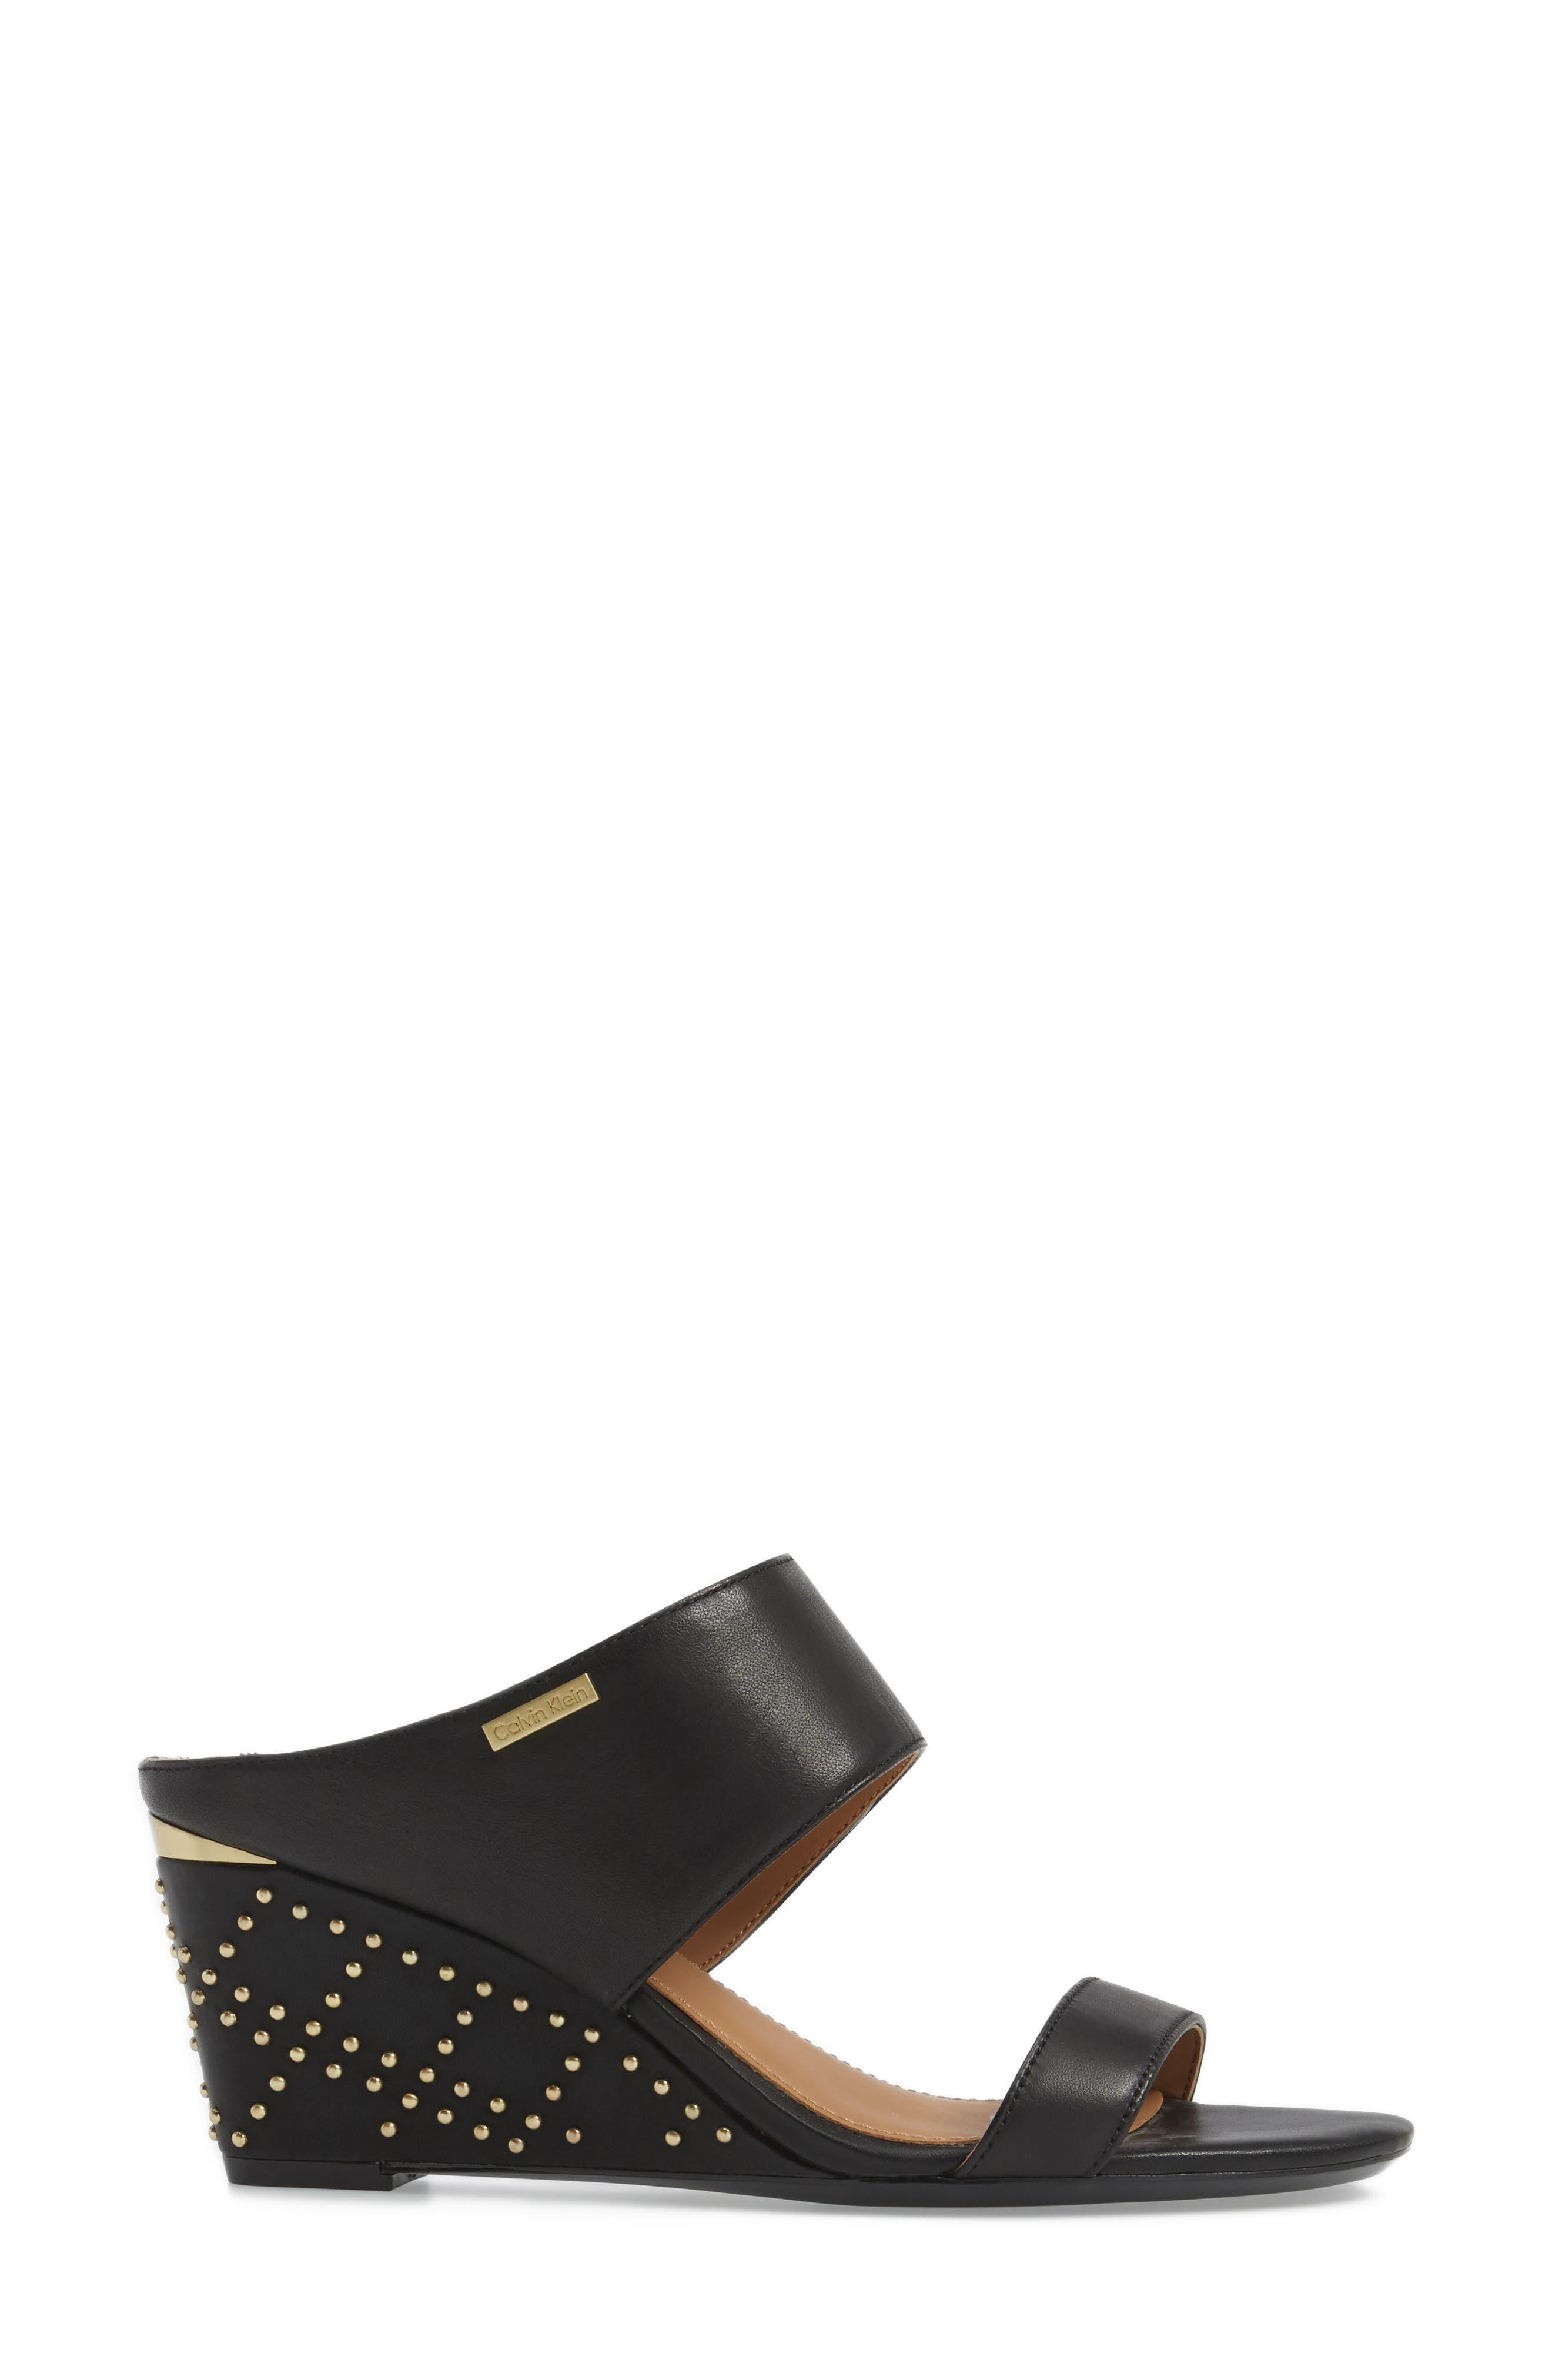 Phyllis Studded Wedge Sandal,                             Alternate thumbnail 11, color,